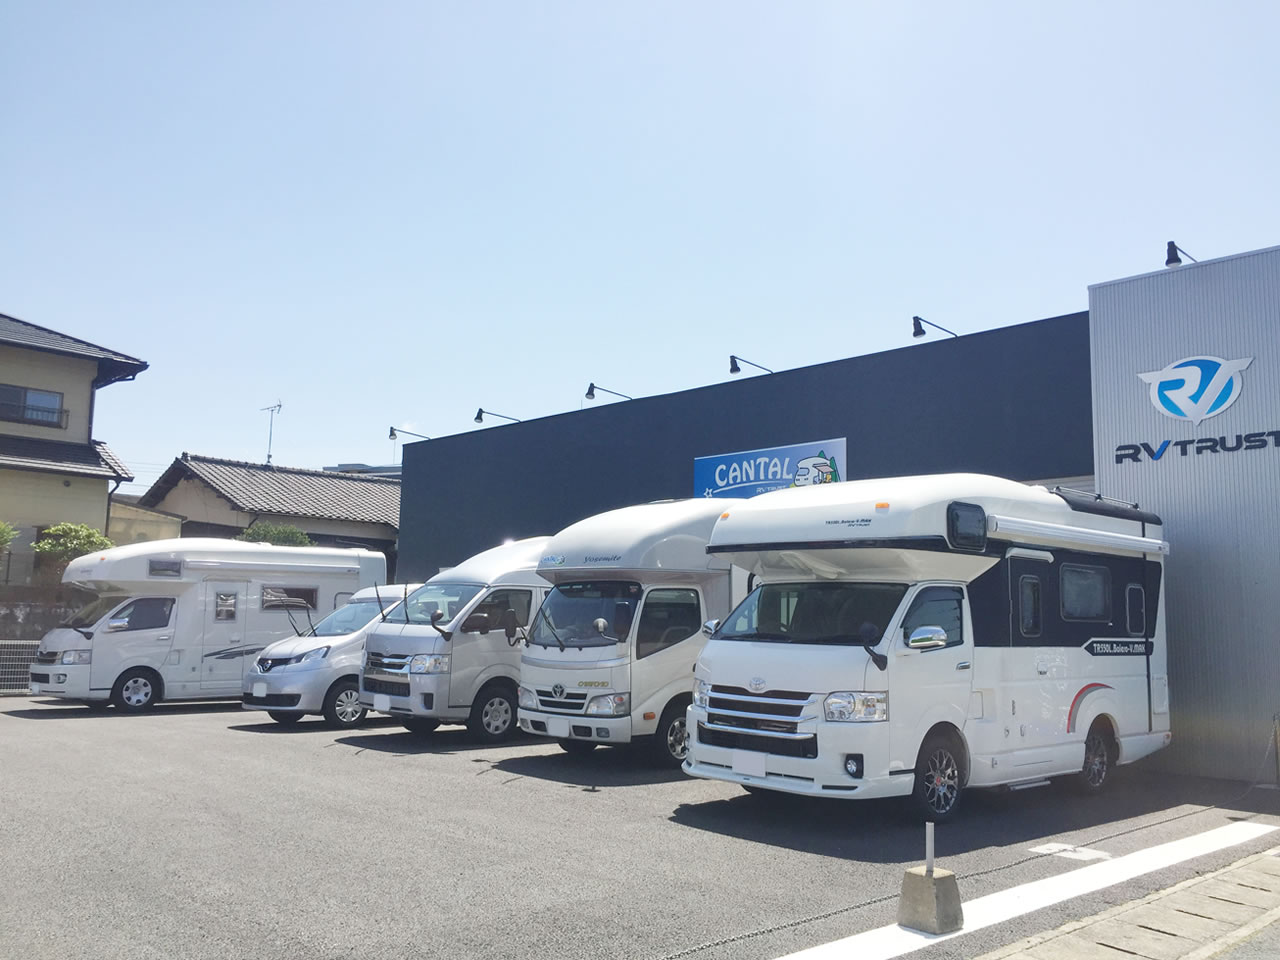 CANTAL(キャンタル) 福岡那珂川店のキャンピングカー集合